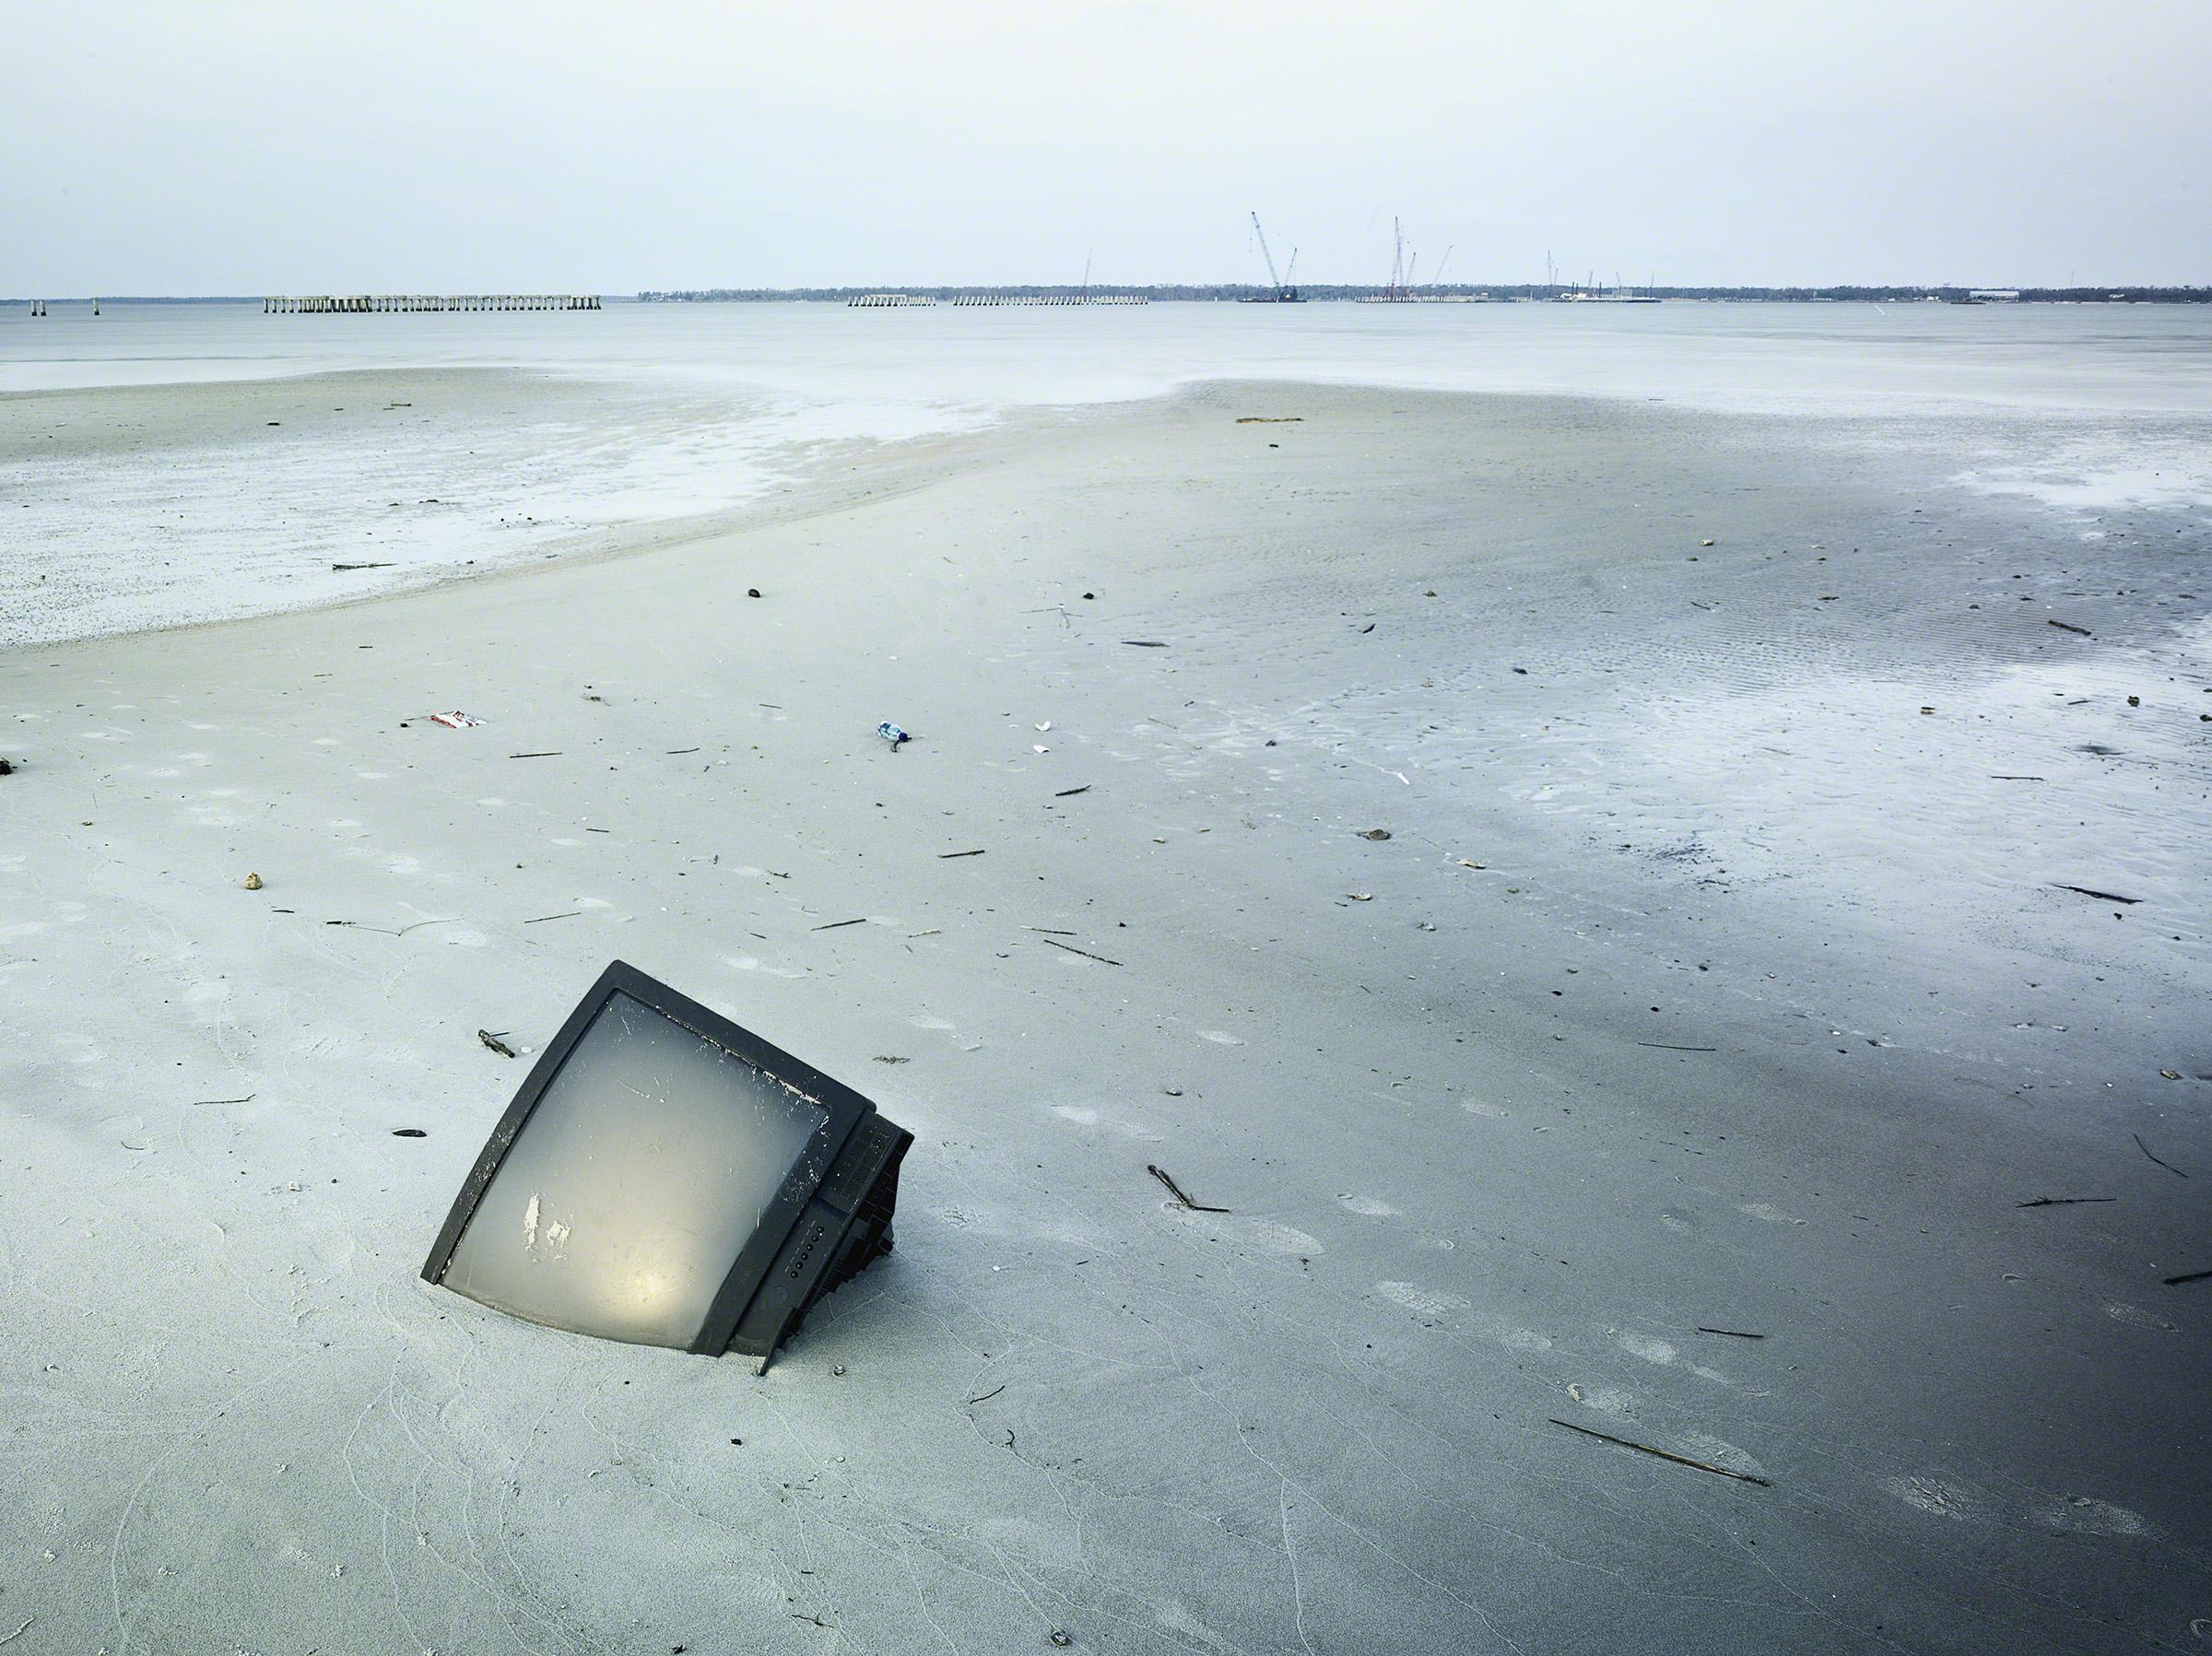 TV in the sand post Hurricane Katrina, Bay St. Louis, Mississippi, USA. Photo: Stephen Wilke